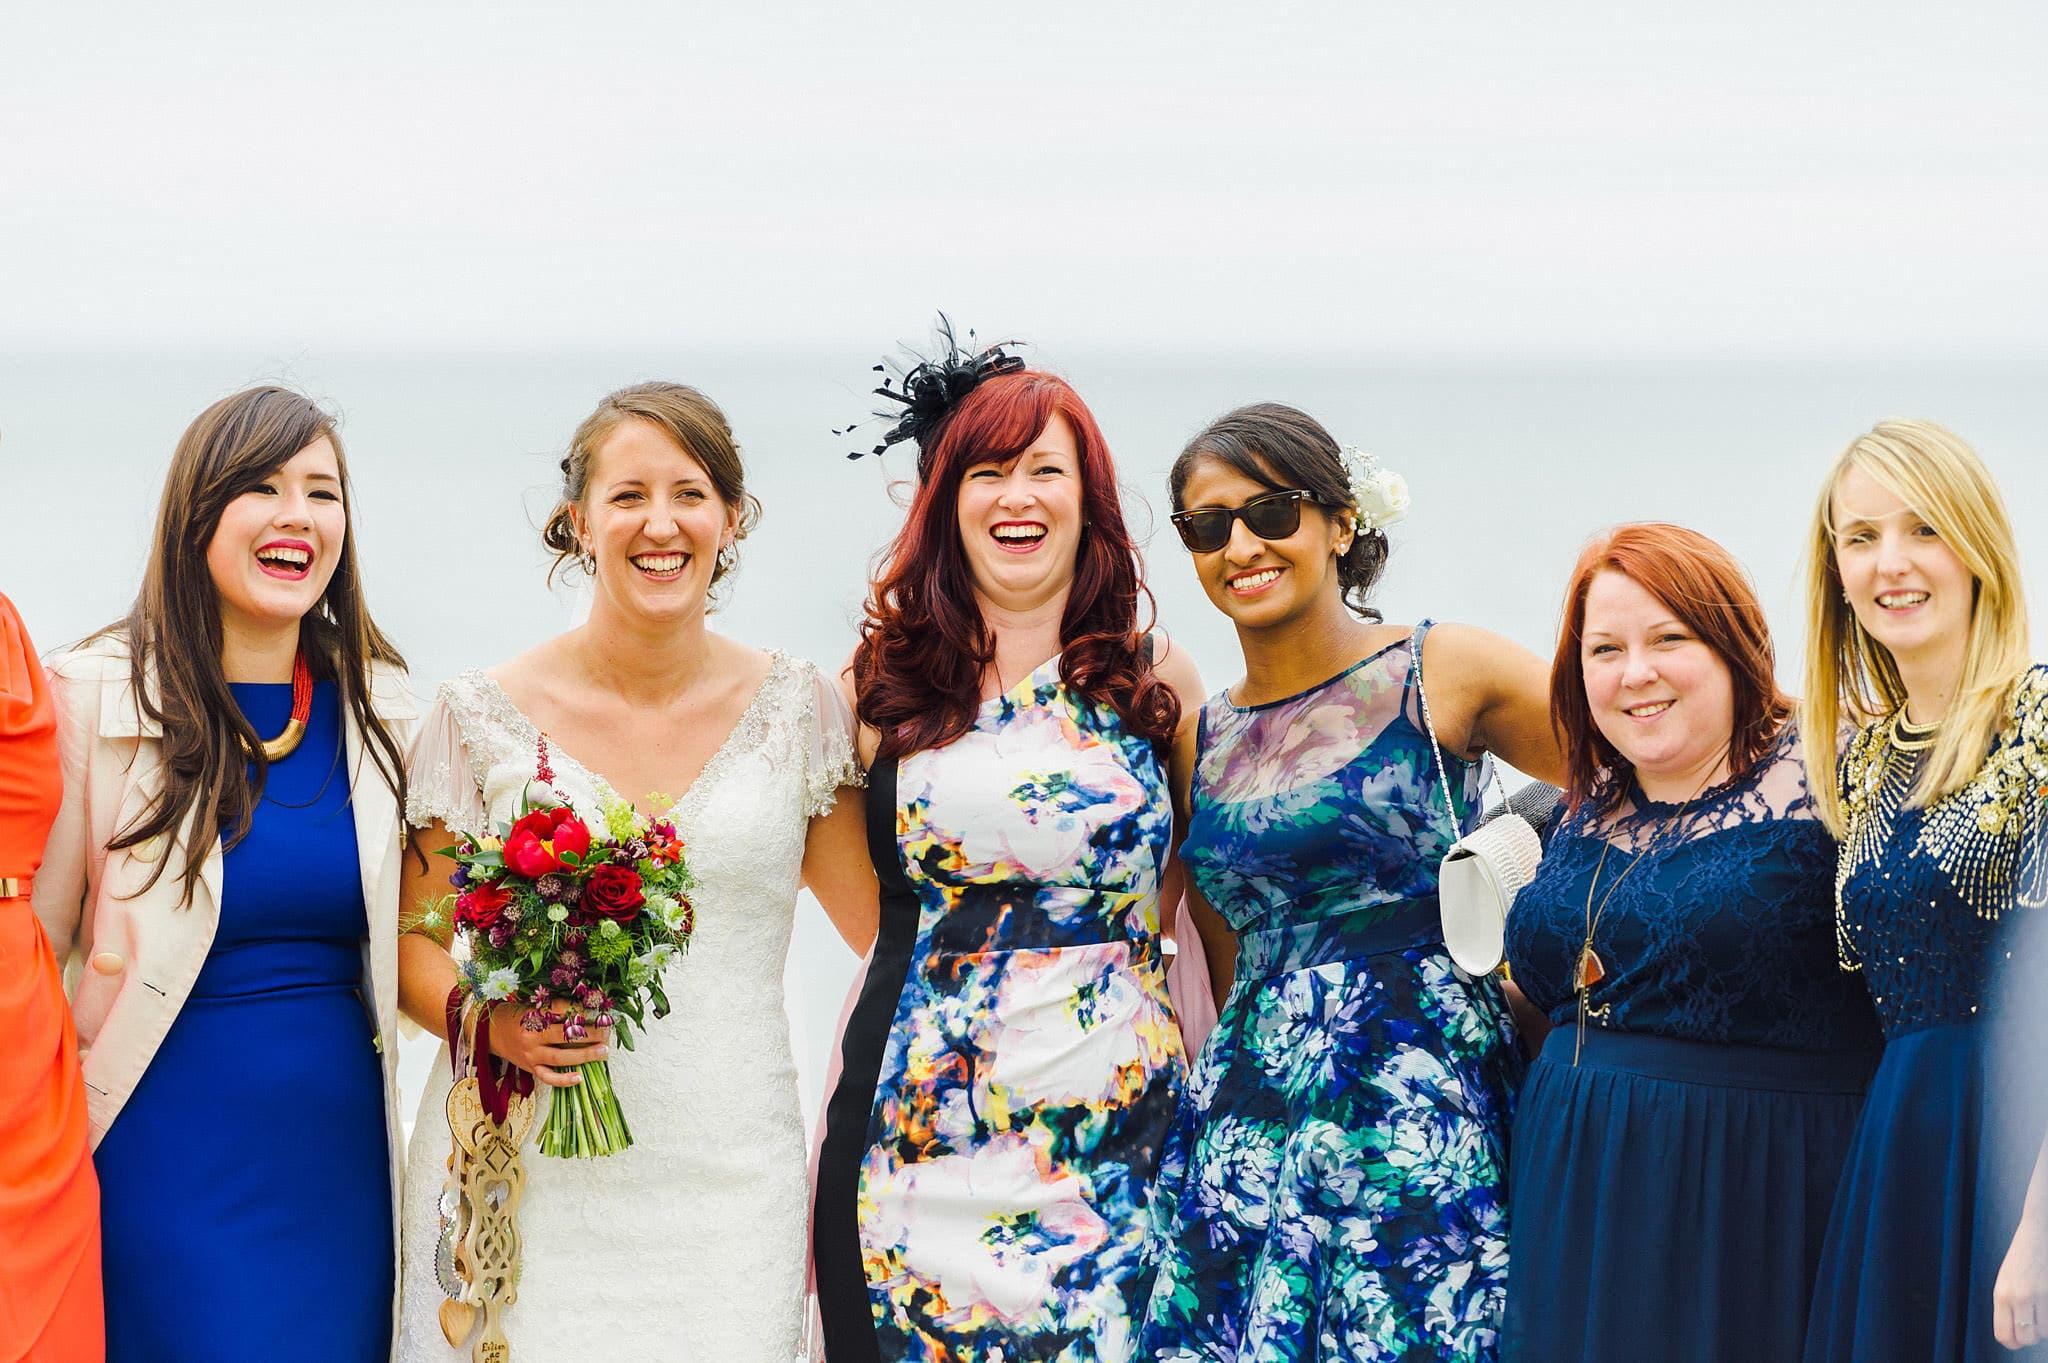 wedding-photographer-aberystwyth-wales (108)